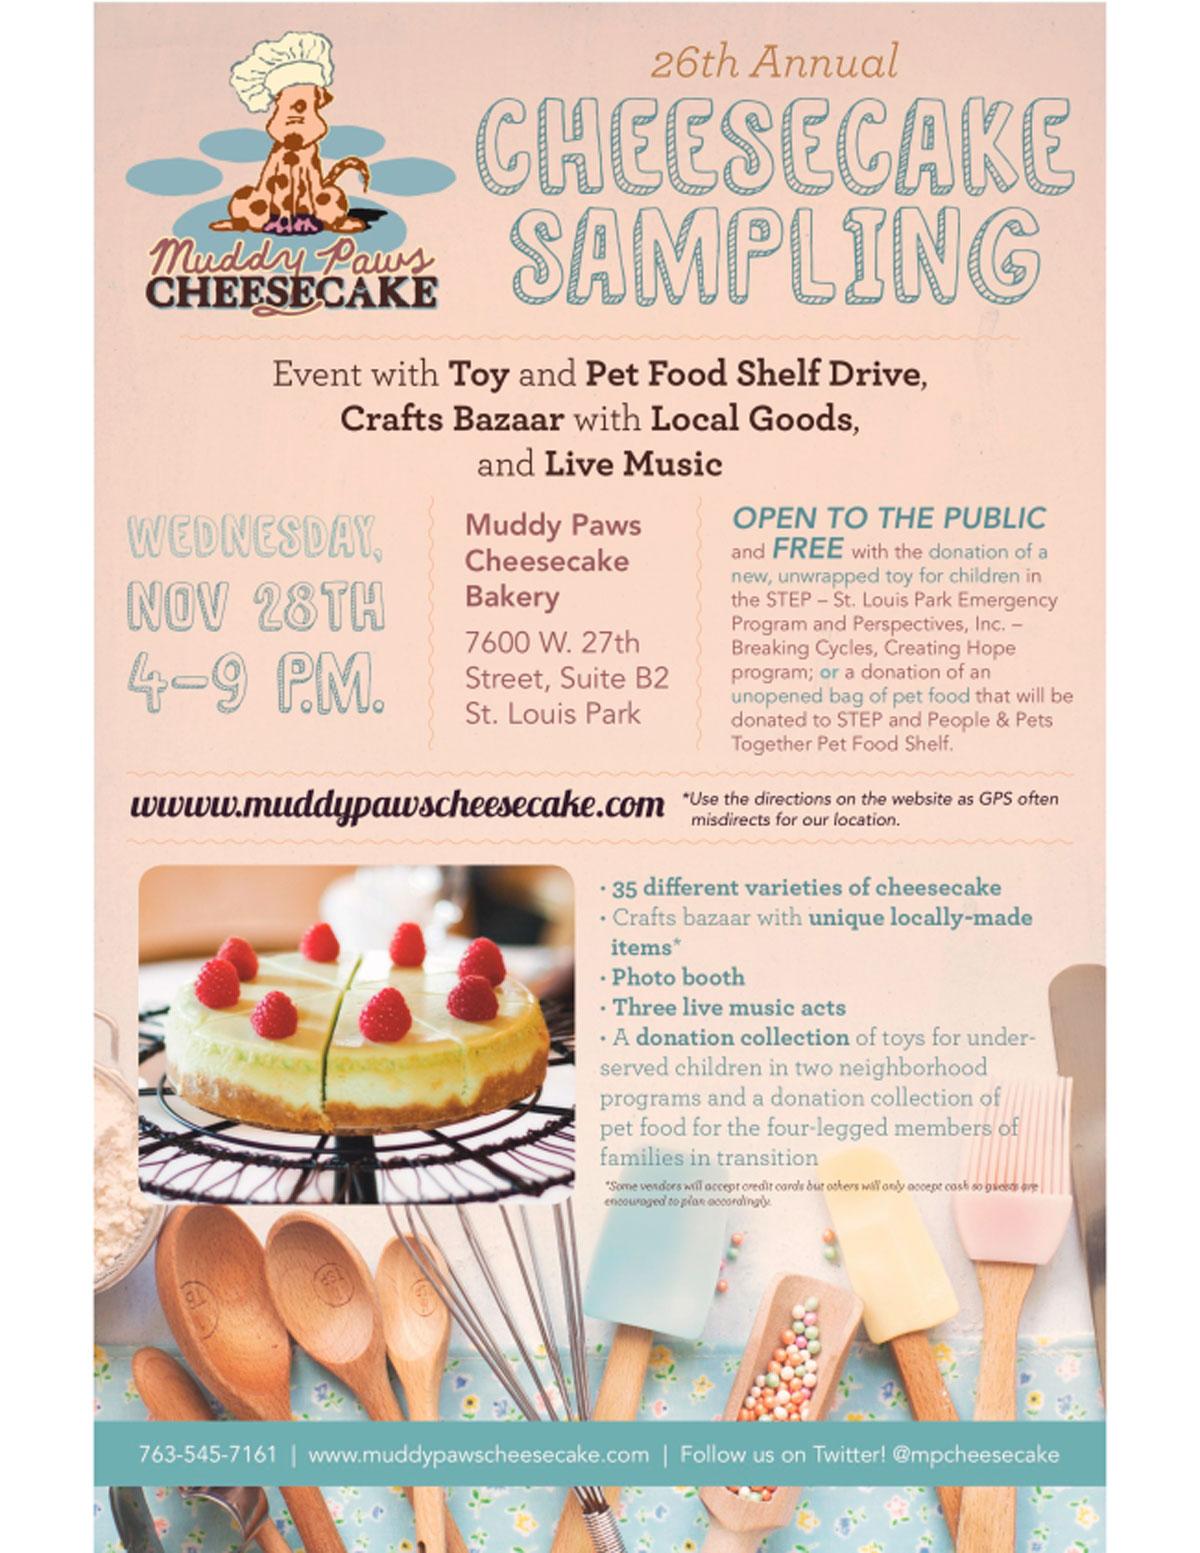 muddypaws cheesecake sampling flyer